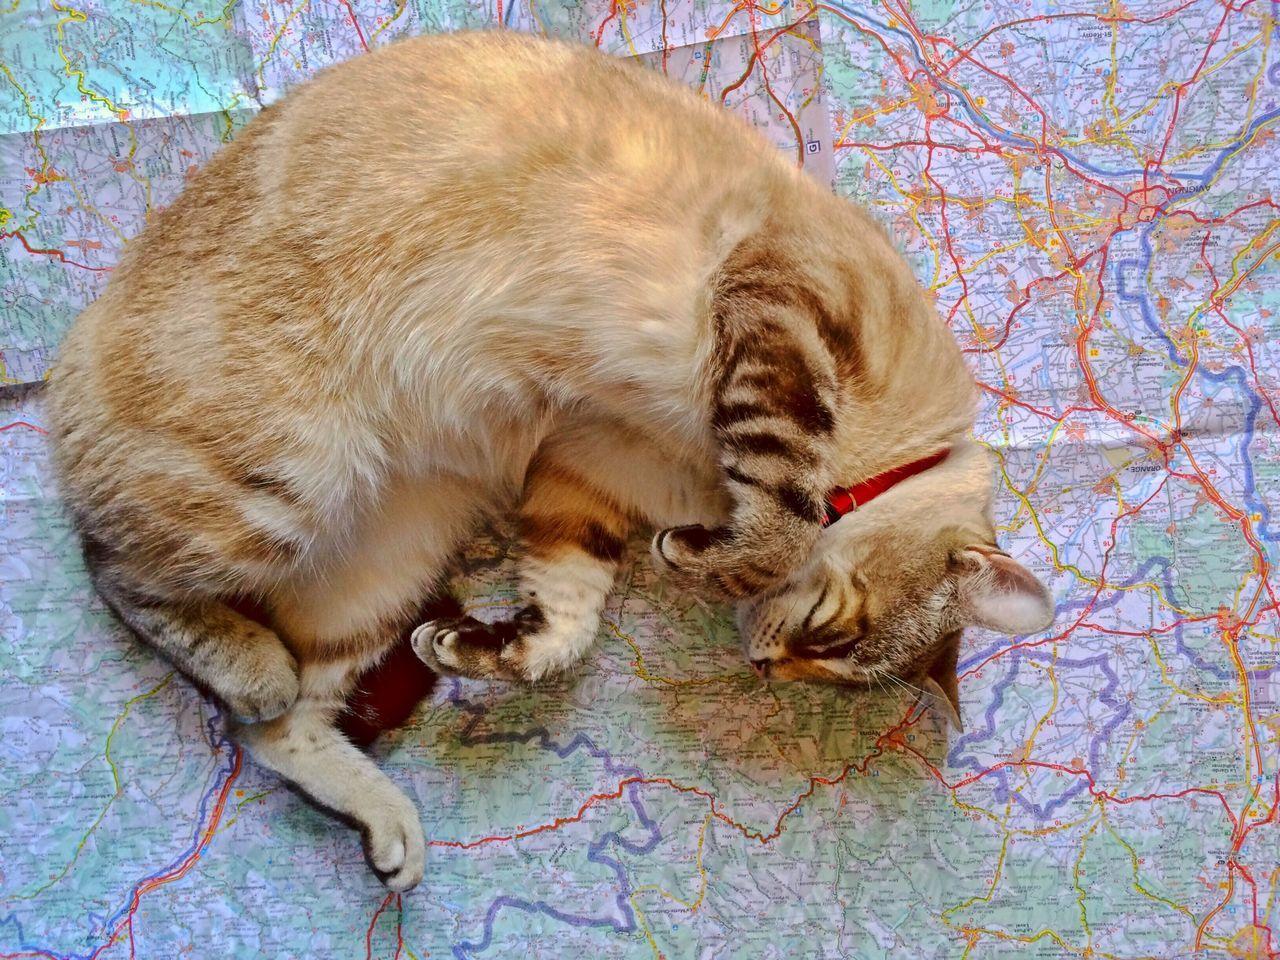 Beautiful stock photos of map, Animal Themes, Cartography, Cat, Domestic Animals